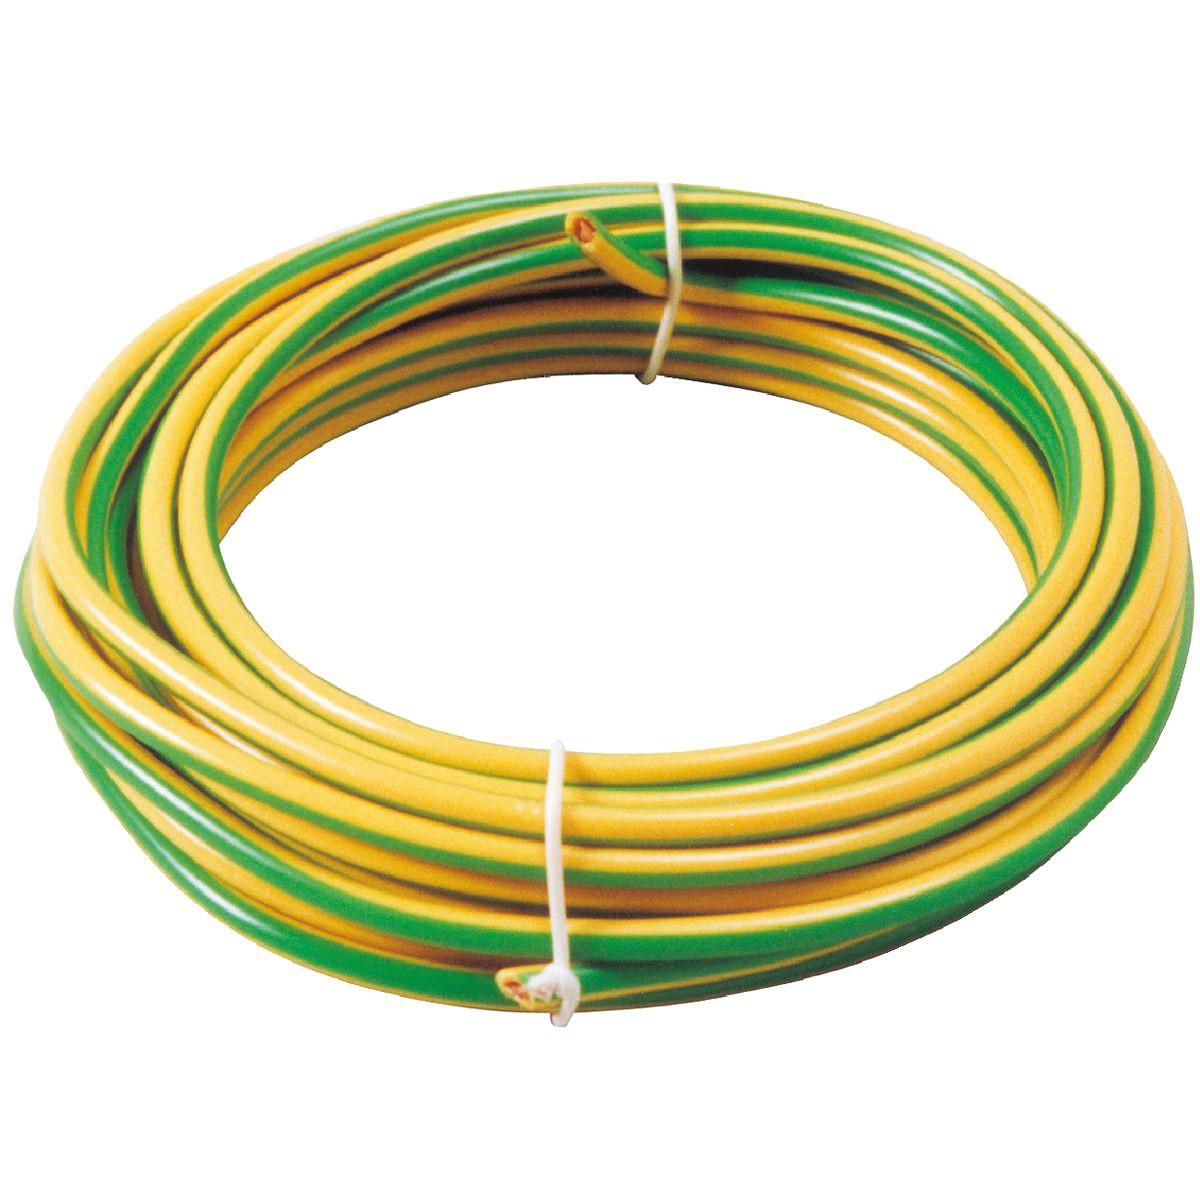 Fil H07 V-U 1,5 mm² Dhome - Longueur 10 m - Vert / jaune